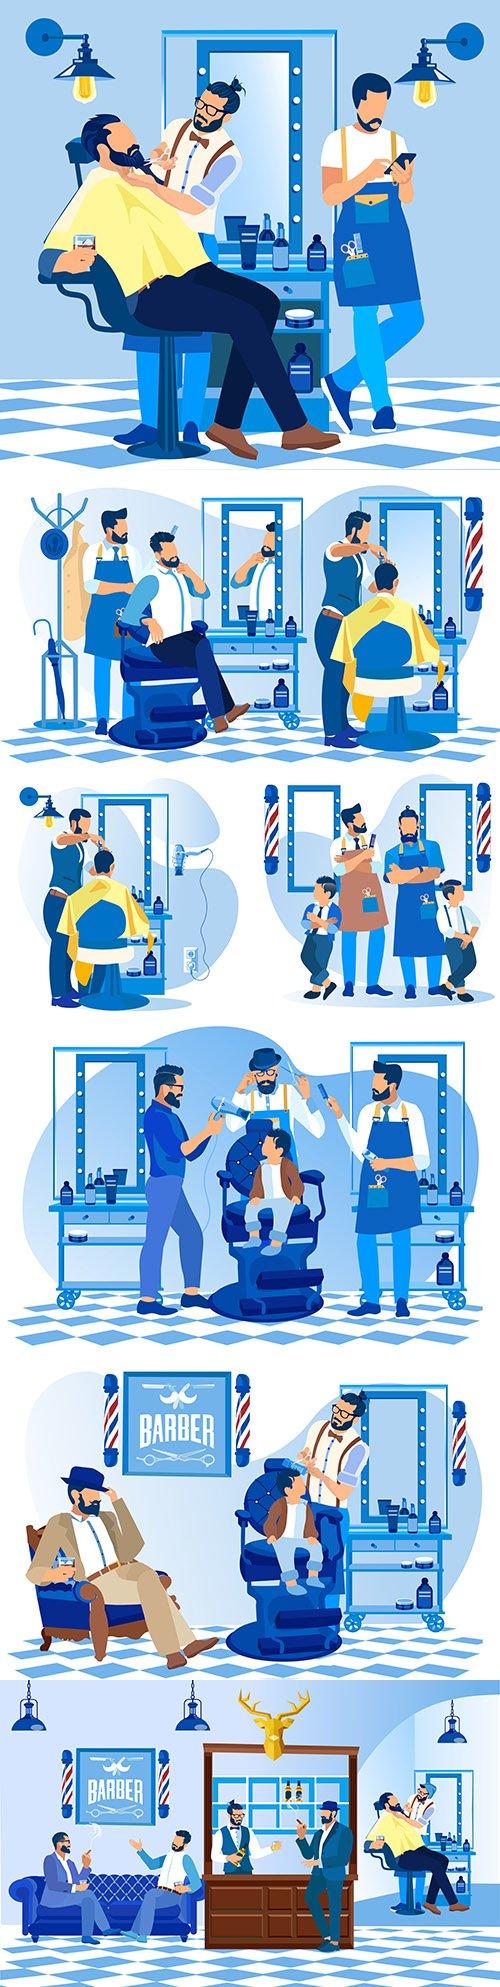 Professional customer haircut at hairdresser fashion salon